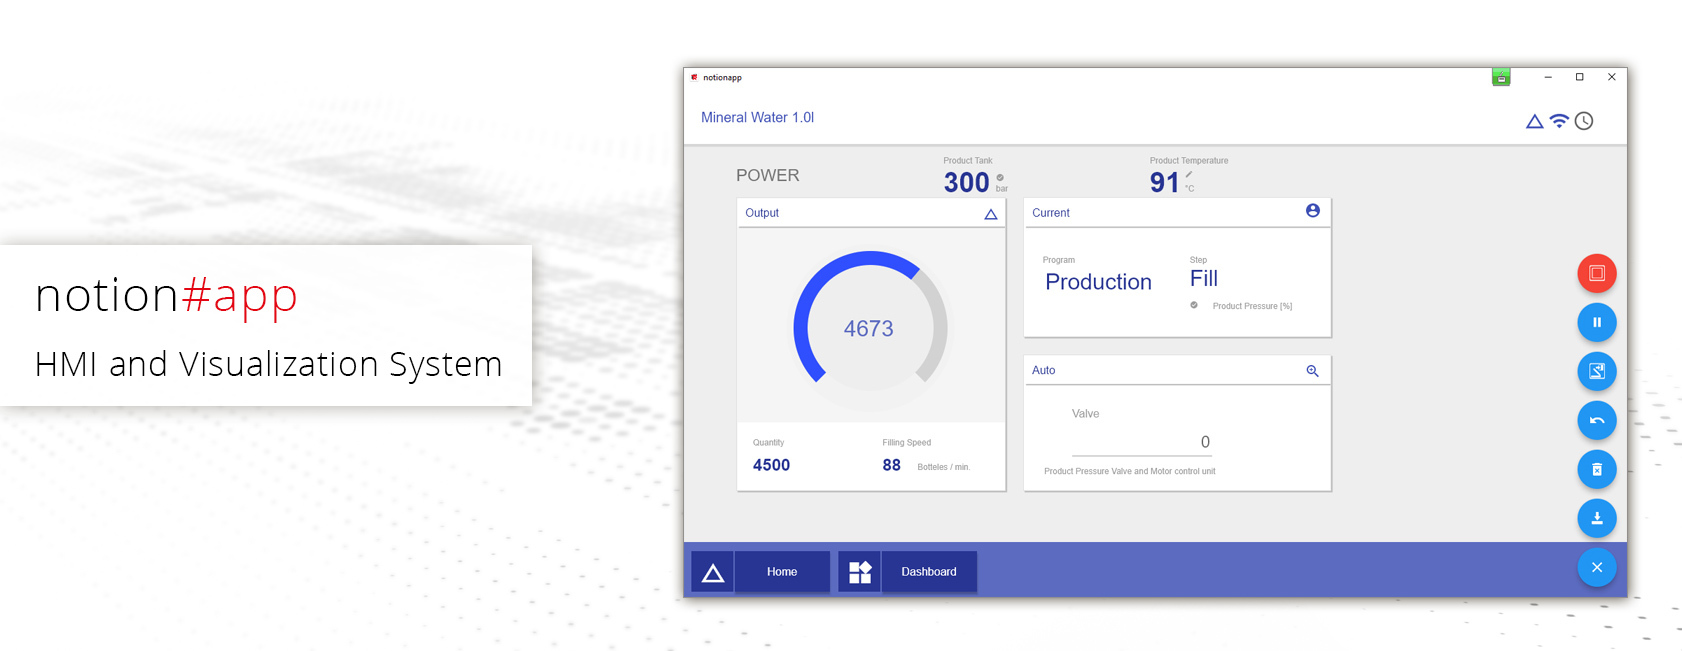 notion#app - HMI and Visualization System